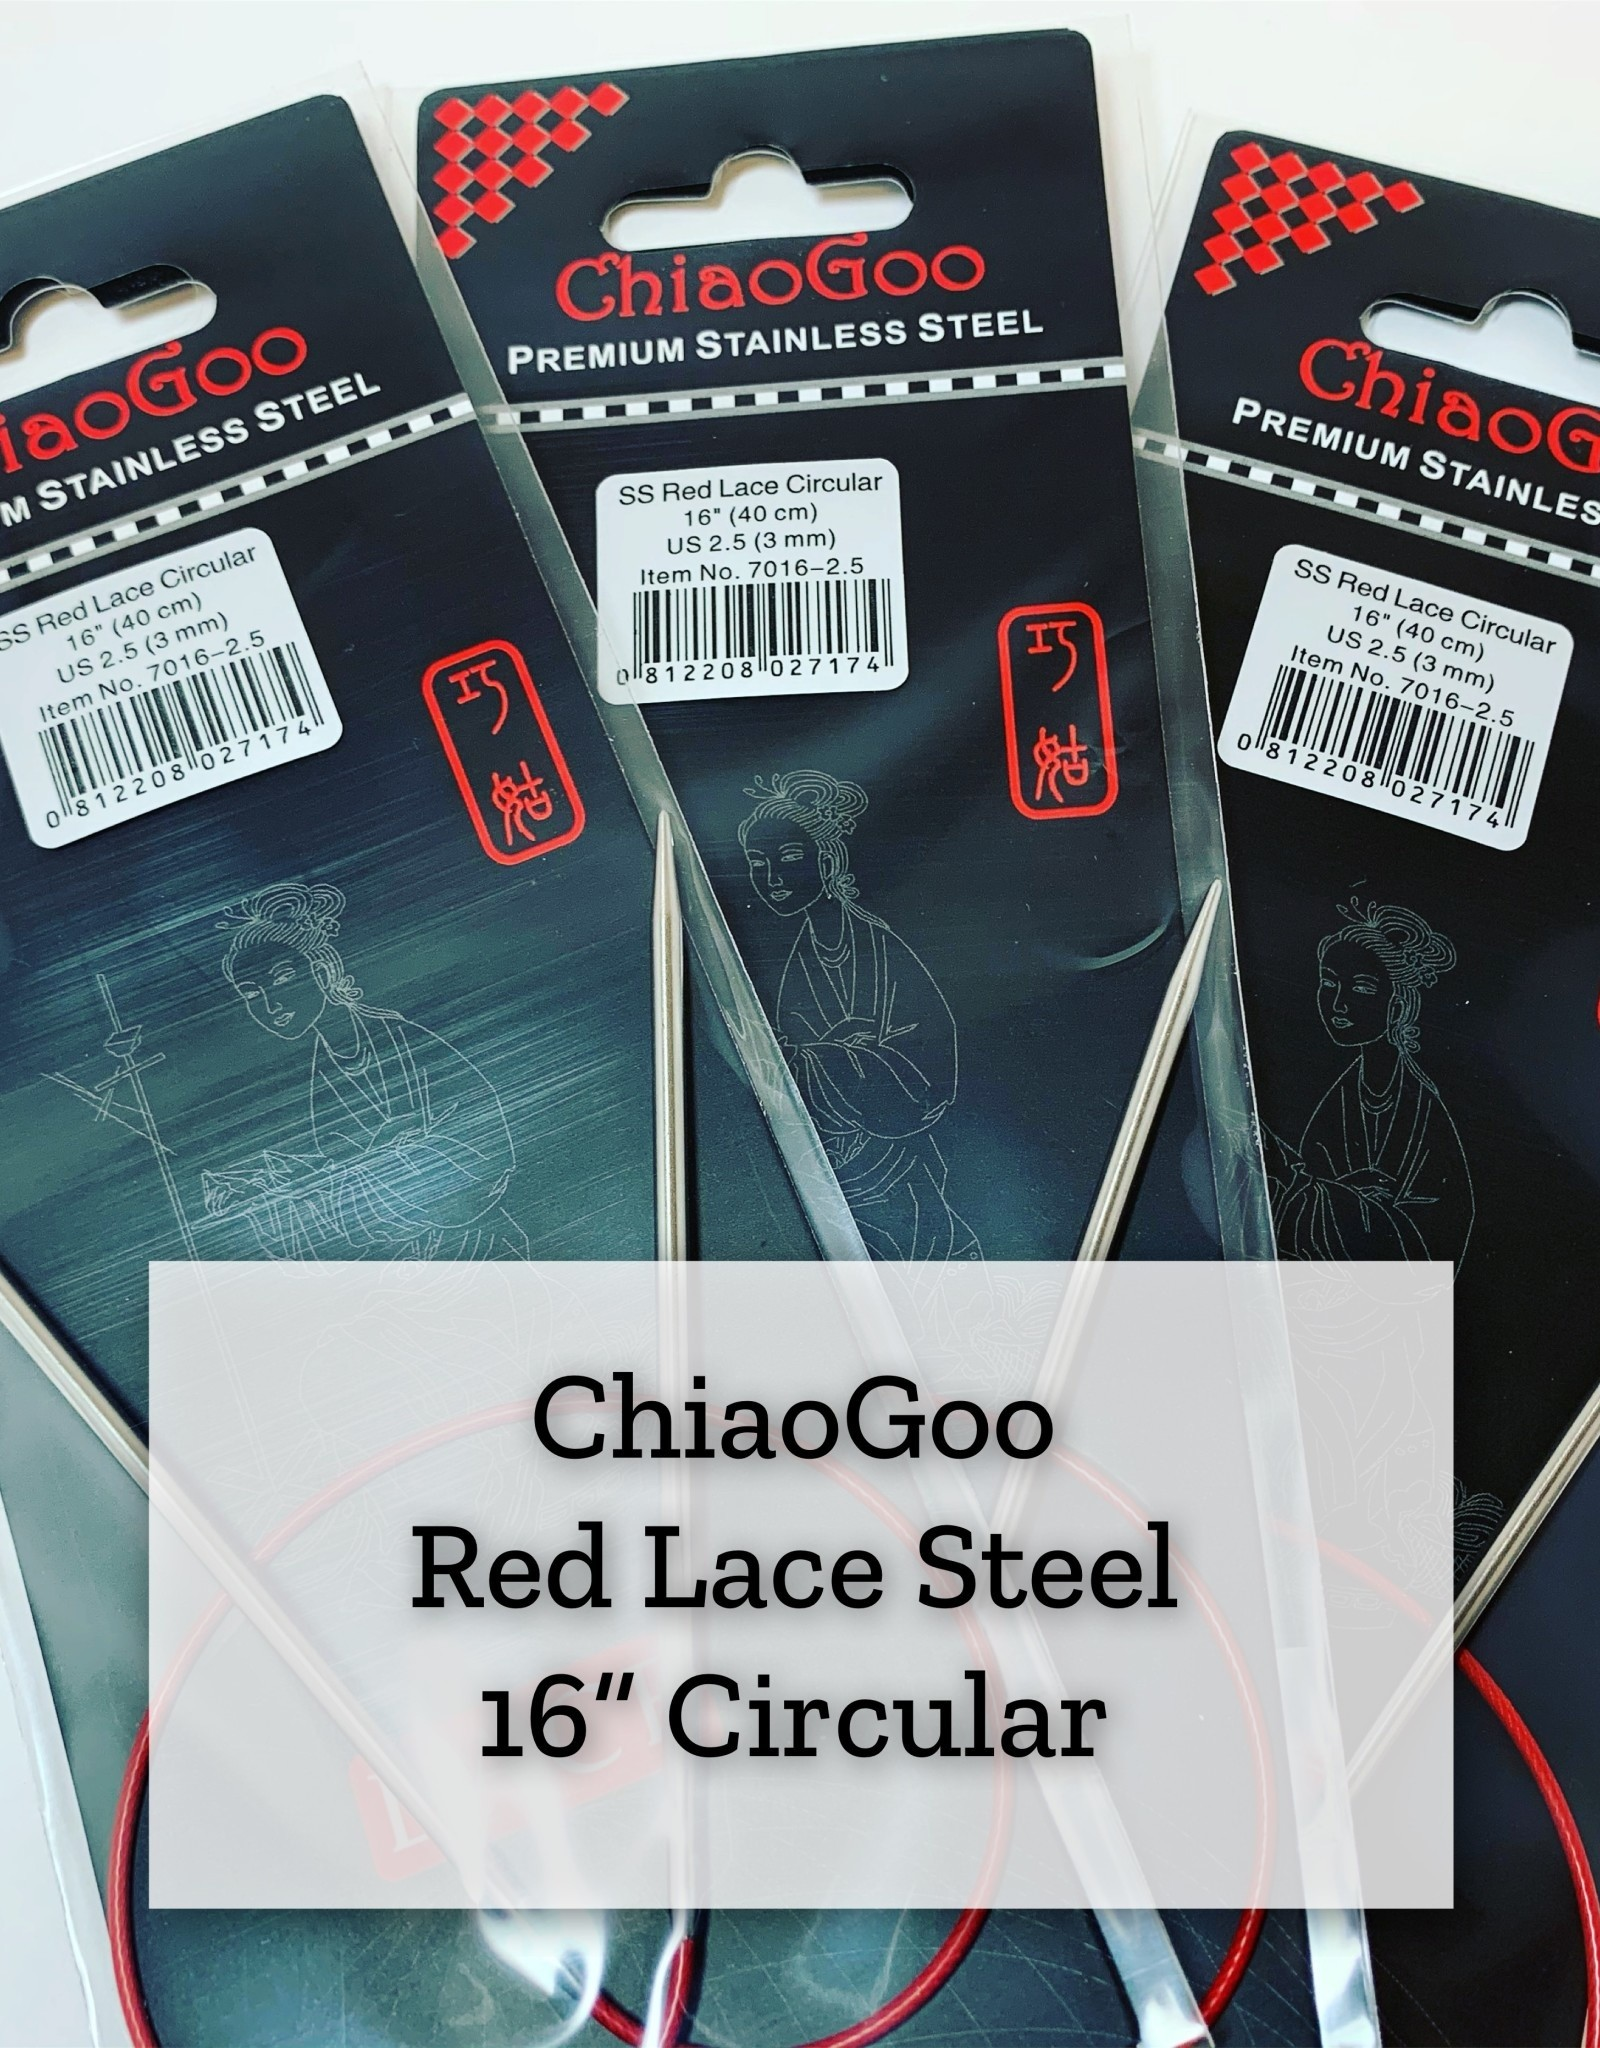 "ChiaoGoo Red Lace Steel - 16"" 5.5 mm"